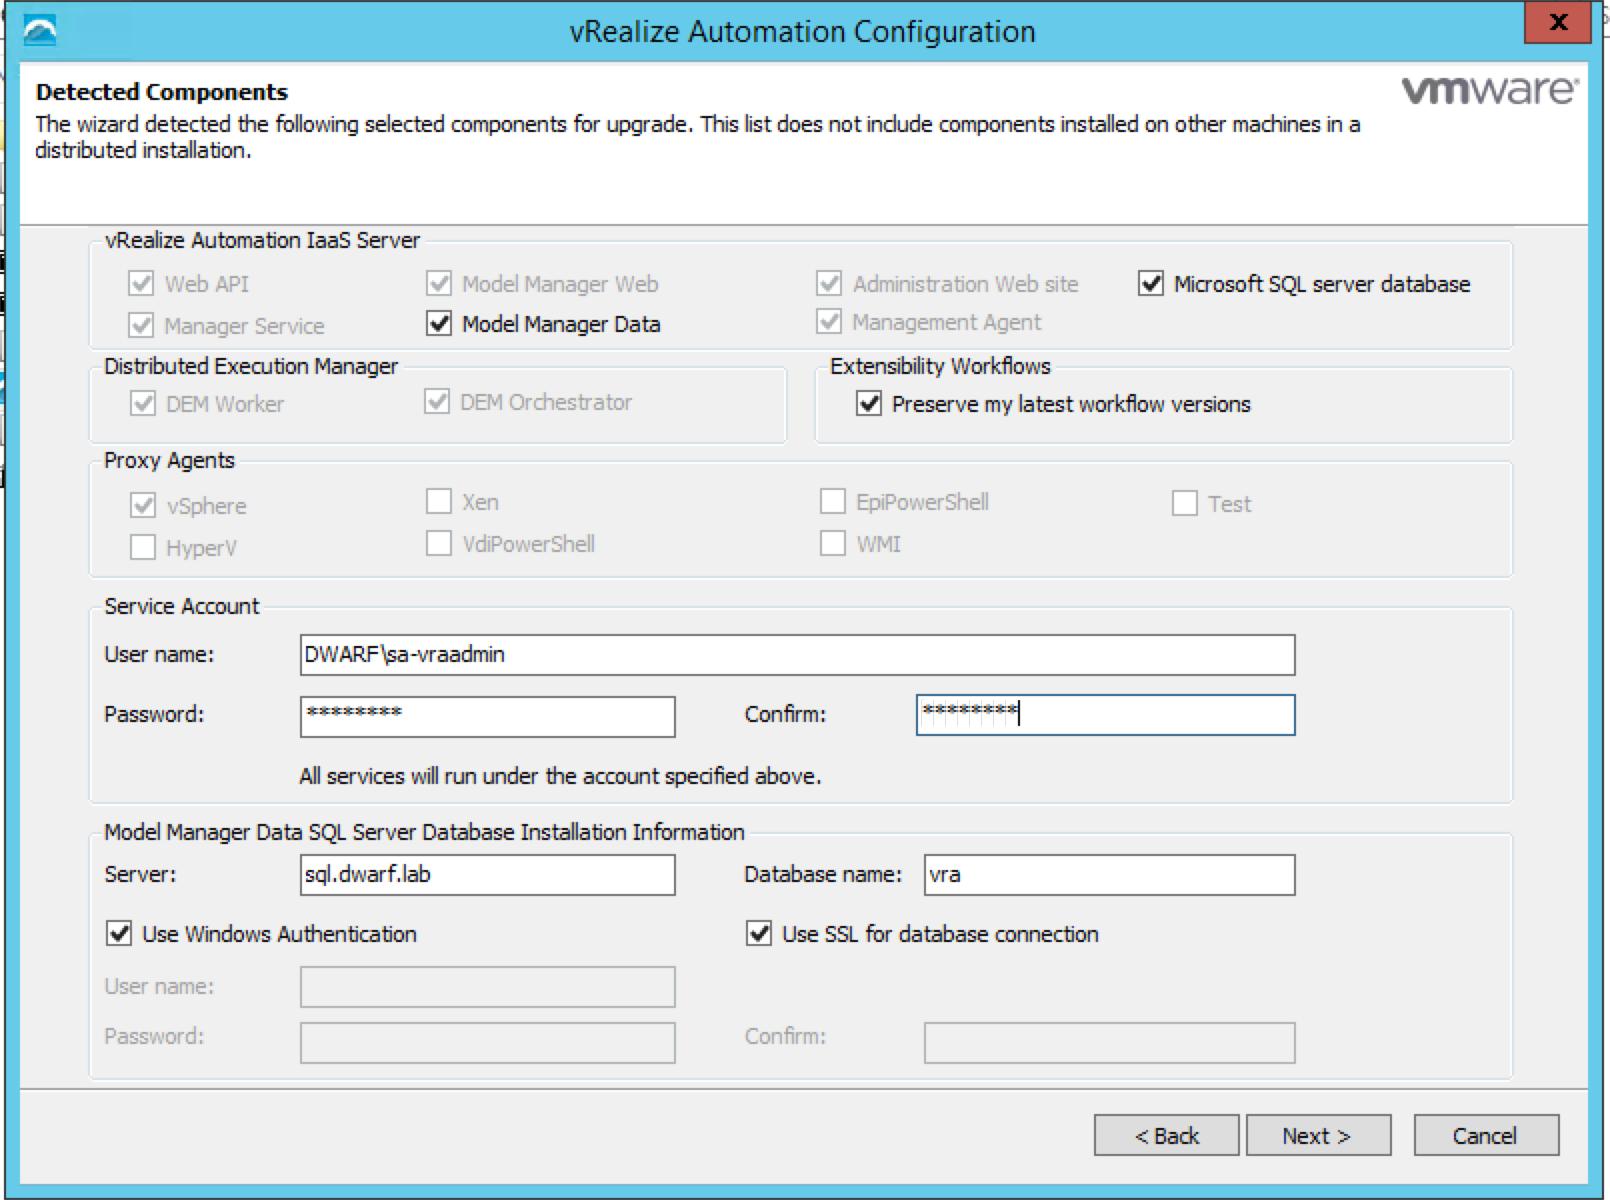 vRA 7.0.1 IaaS Installation – 6